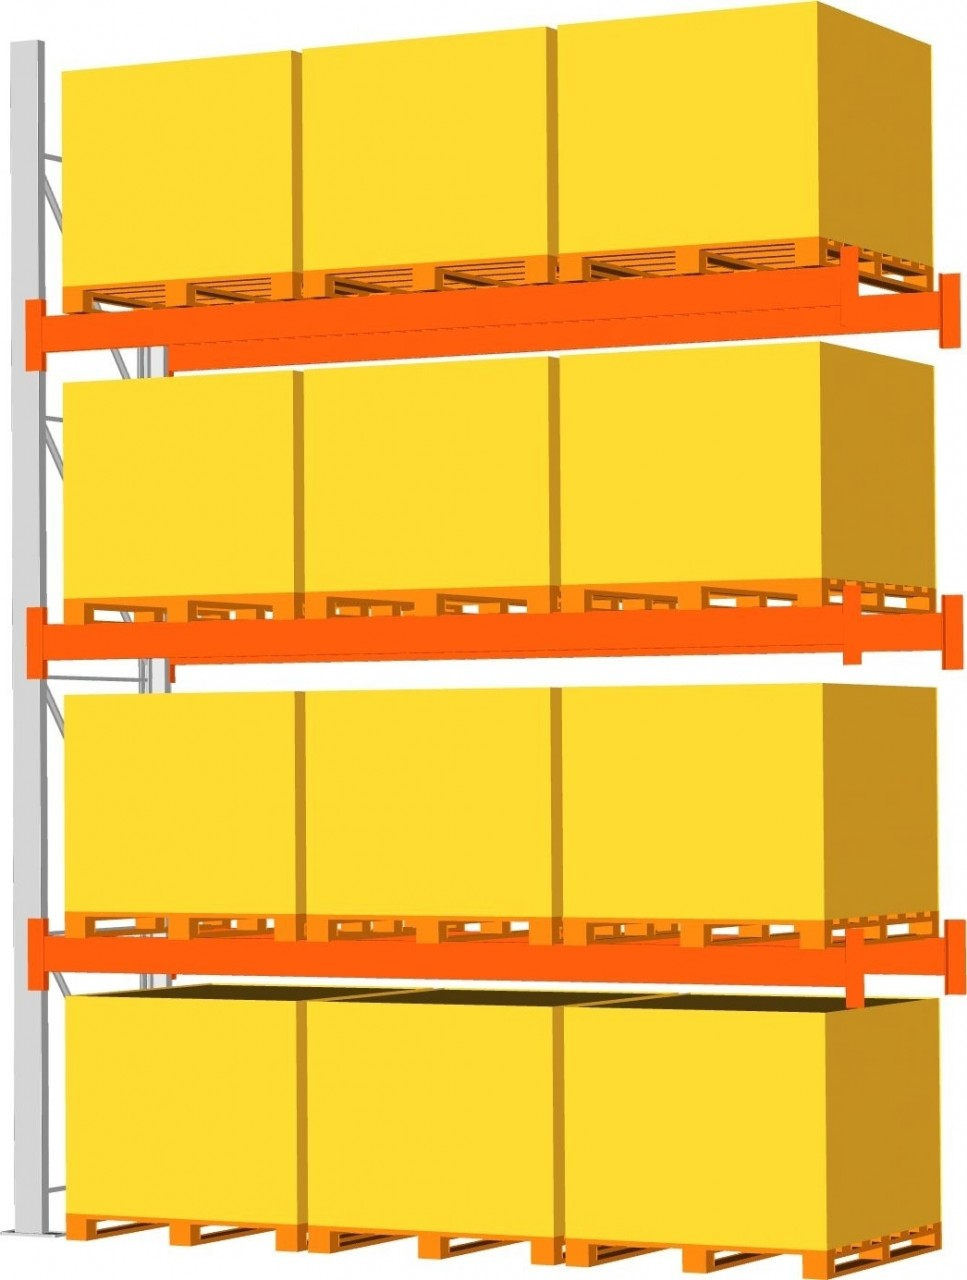 Anbauregal META MULTIPAL,HxBxT 3300x2700x1100mm, 3 Trägerpaare, Paletten bis 800 kg